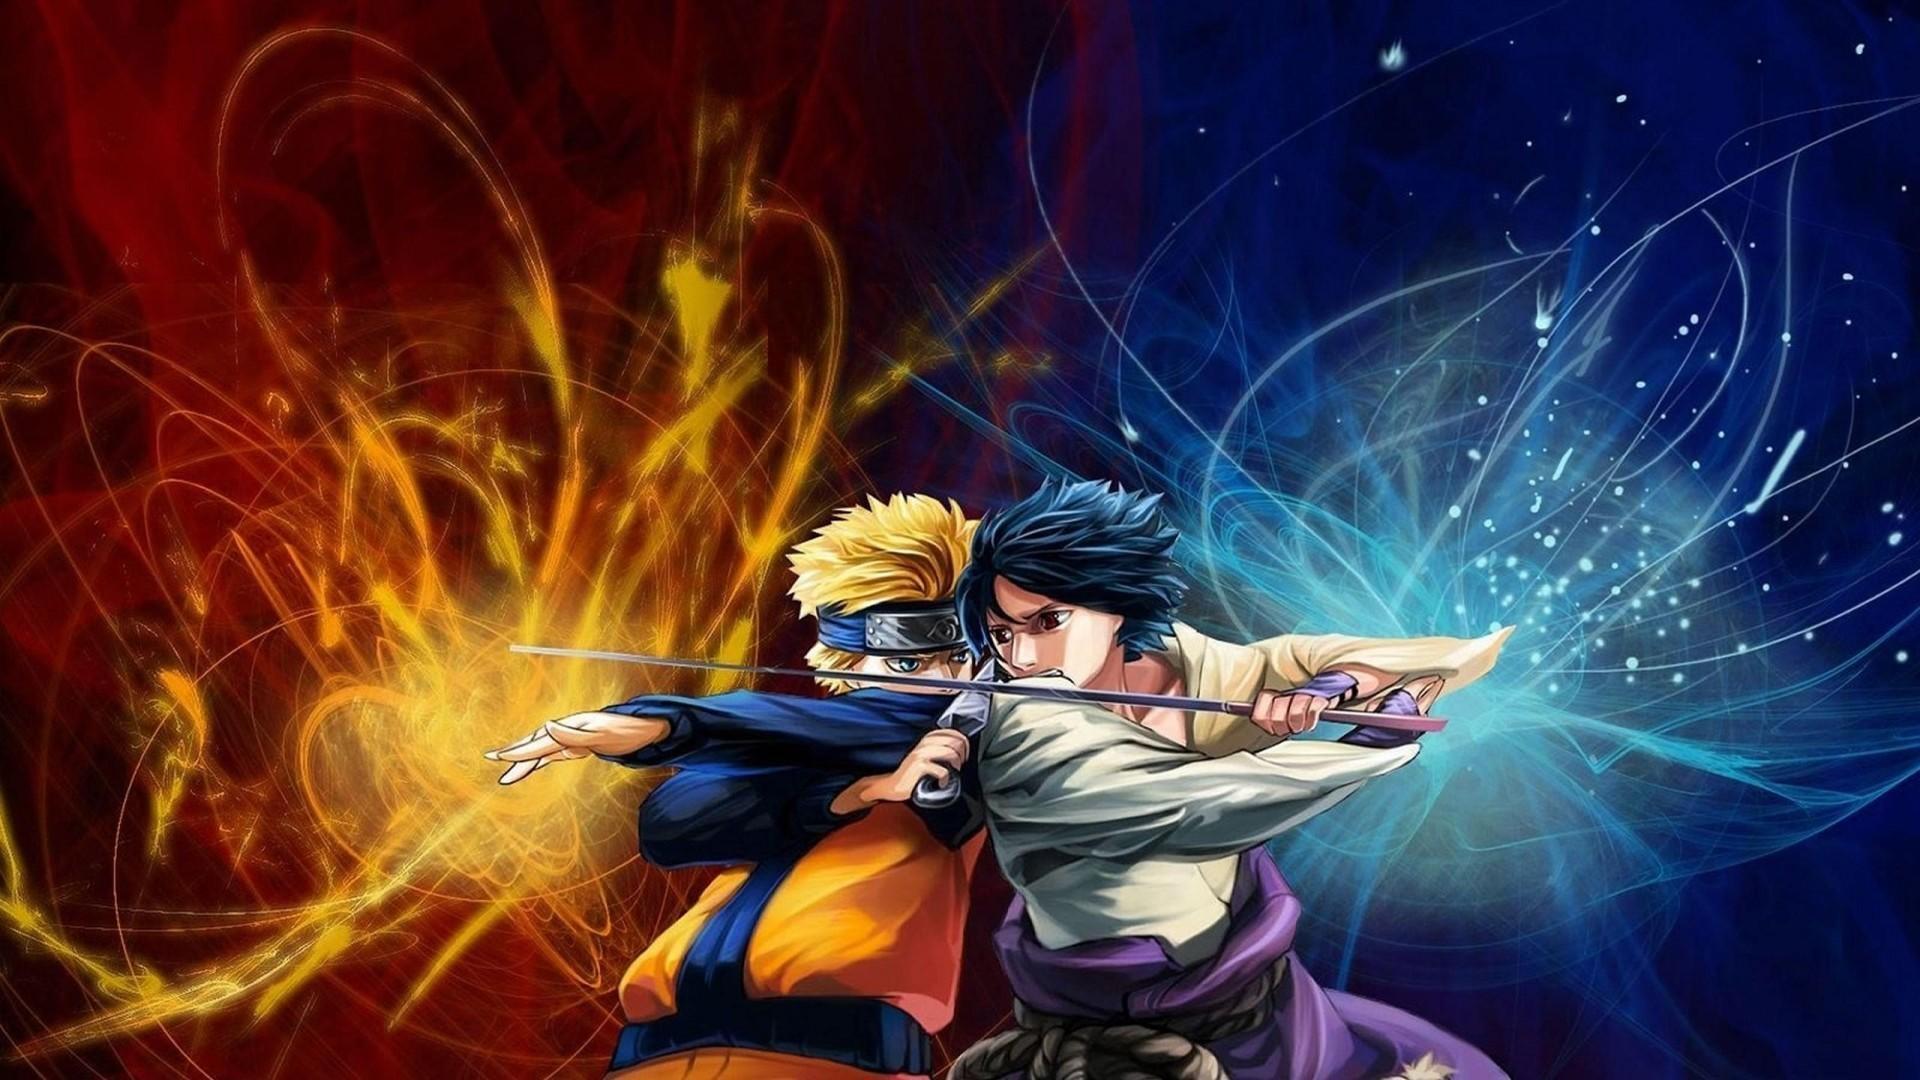 naruto vs sasuke wallpapers wallpaper cave